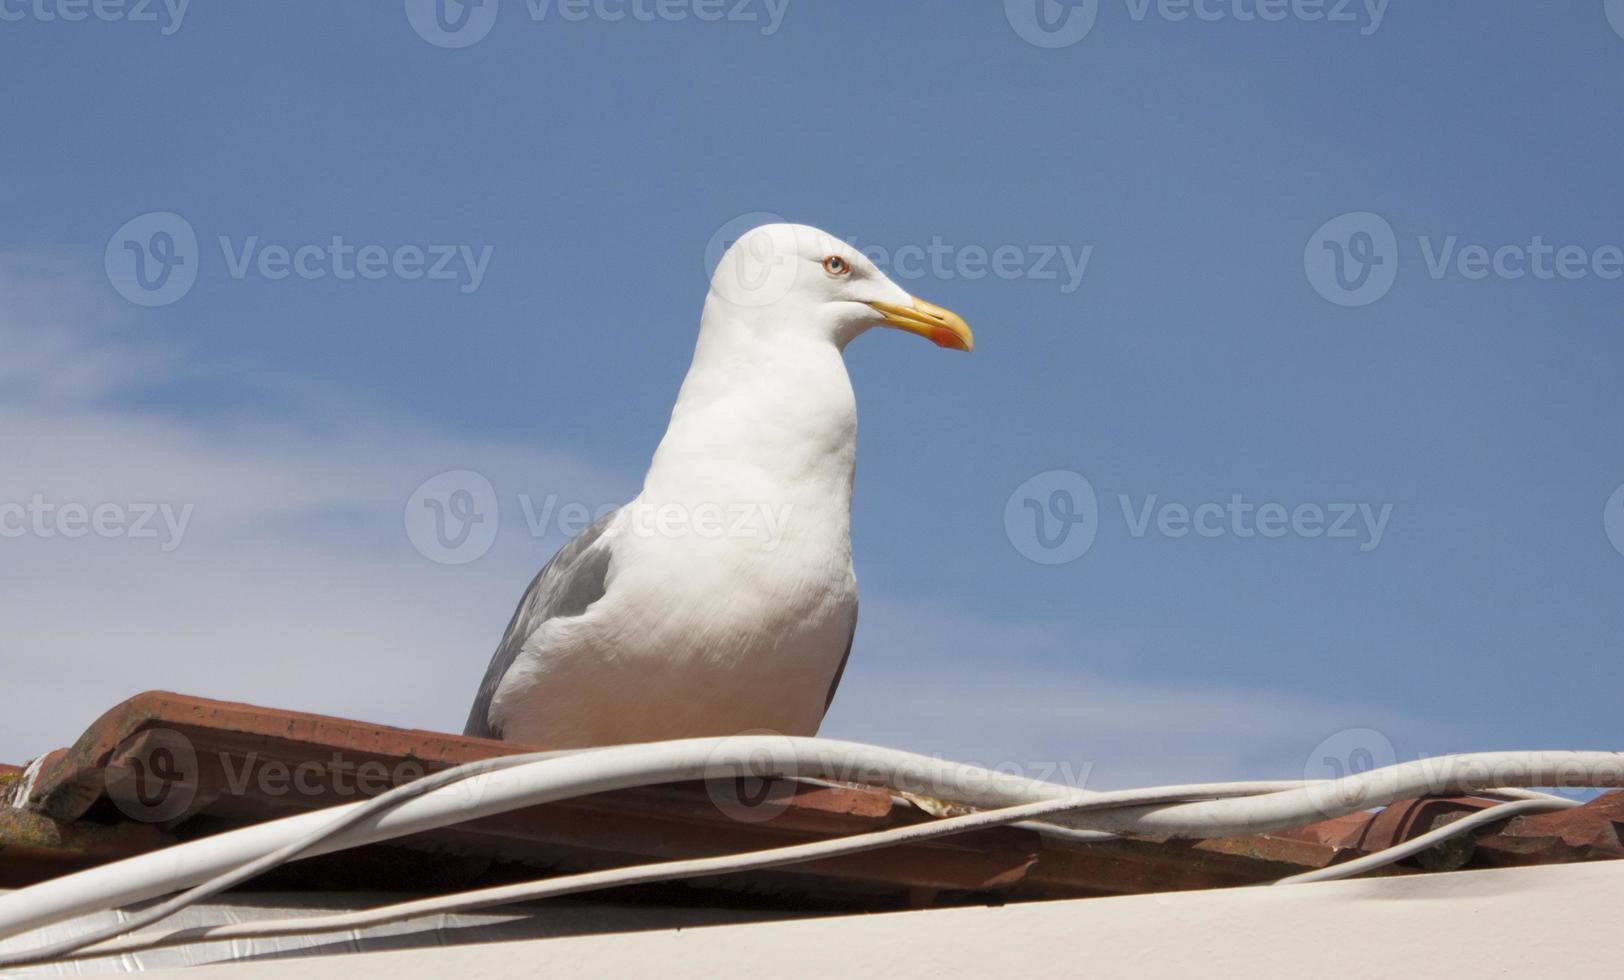 Caspian Gull photo